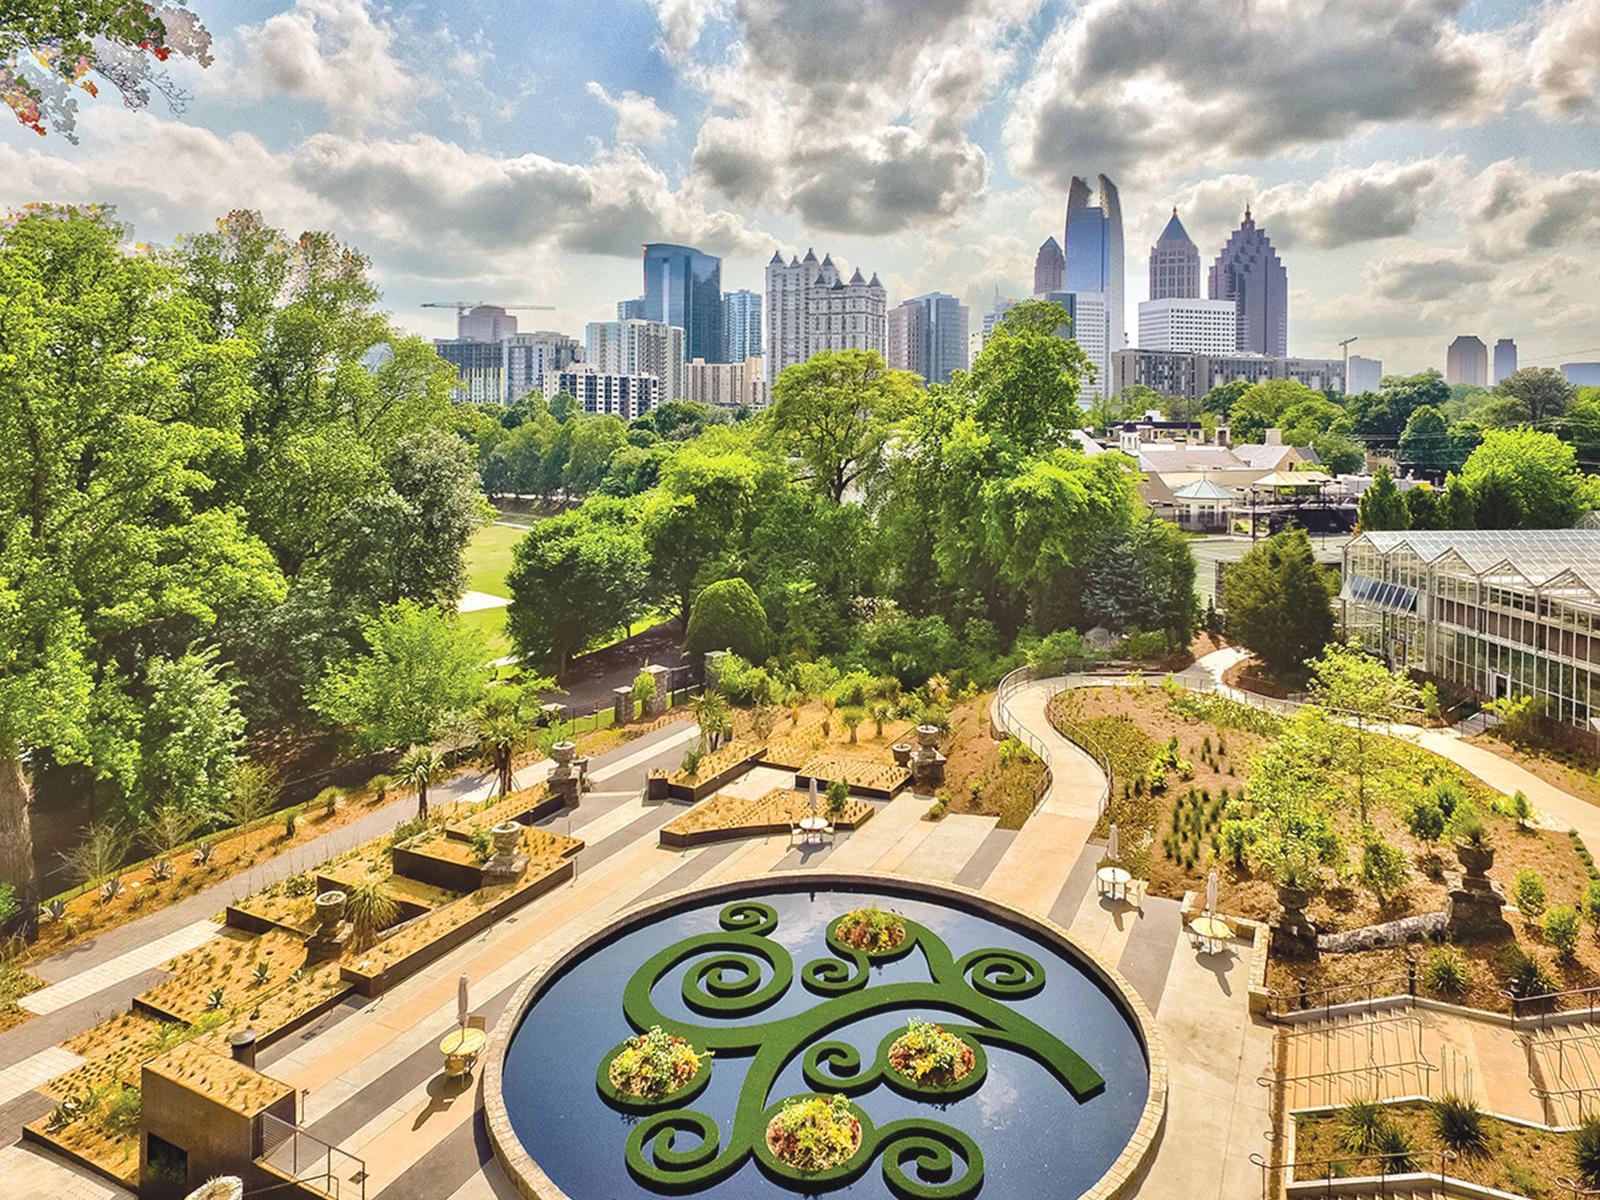 Atlanta Botanical Garden opens Skyline Garden | Northside / Sandy Springs Neighbor | mdjonline.com